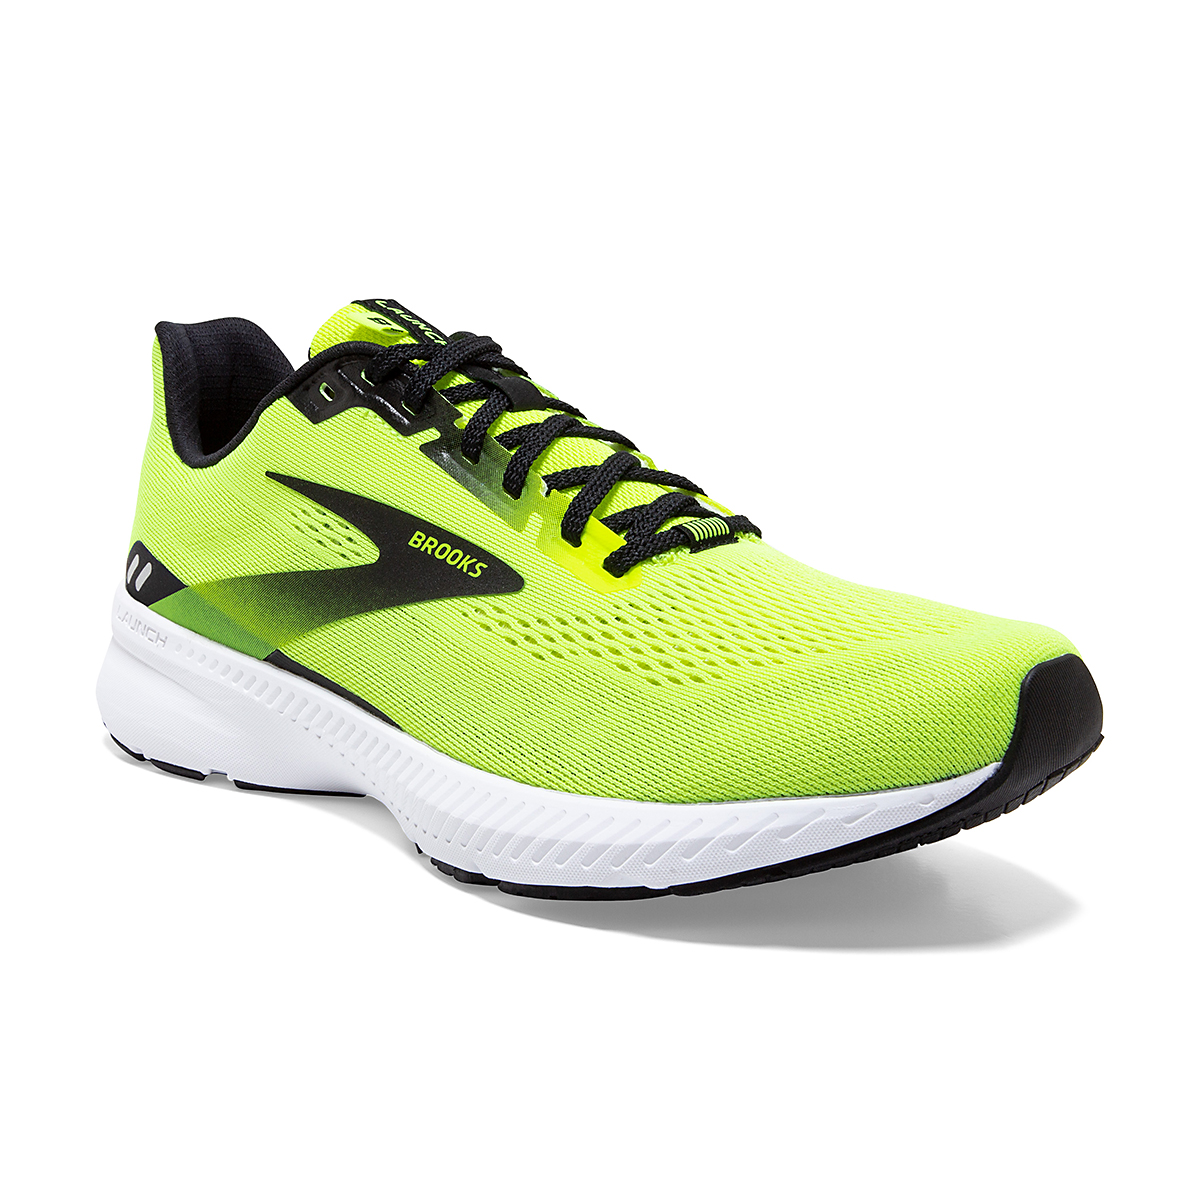 Men's Brooks Launch 8 Running Shoe - Color: Nightlife/Black/White - Size: 7 - Width: Regular, Nightlife/Black/White, large, image 2